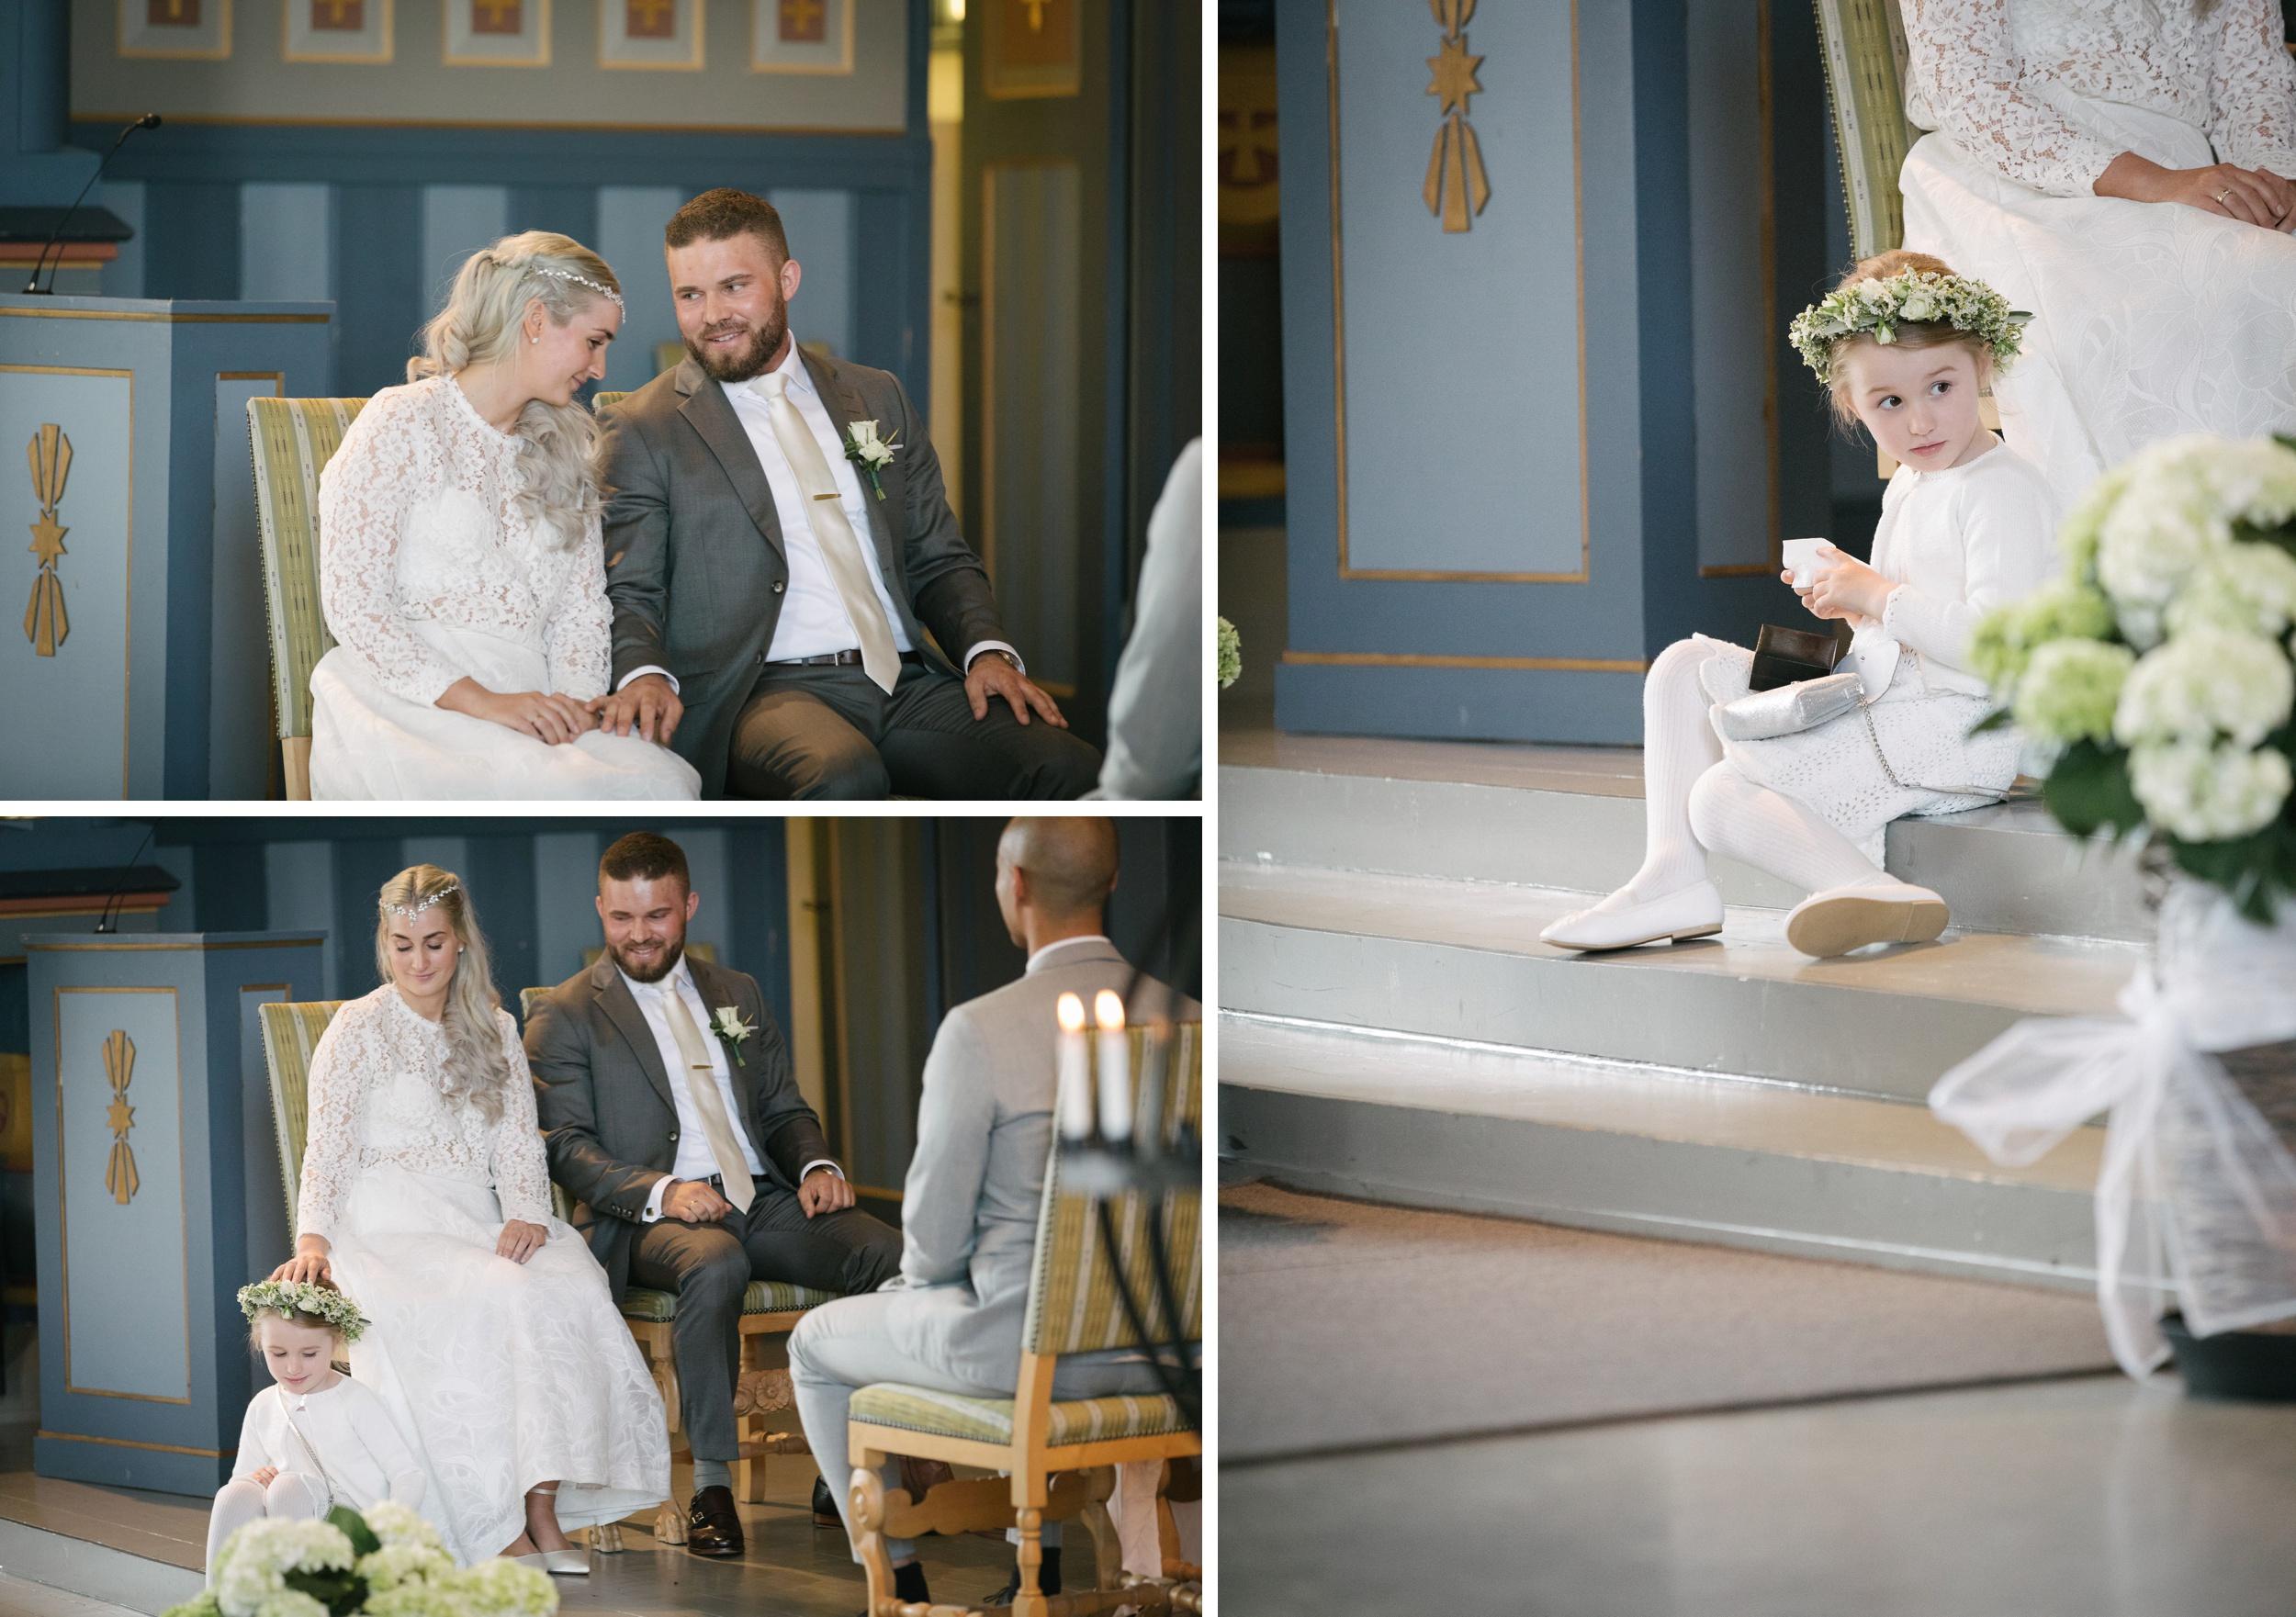 bryllup-bryllupsfotografering-bryllupsfotograf-sarpsborg-20170520-_H2A0504Camilla-og-ruben_WEB.jpg